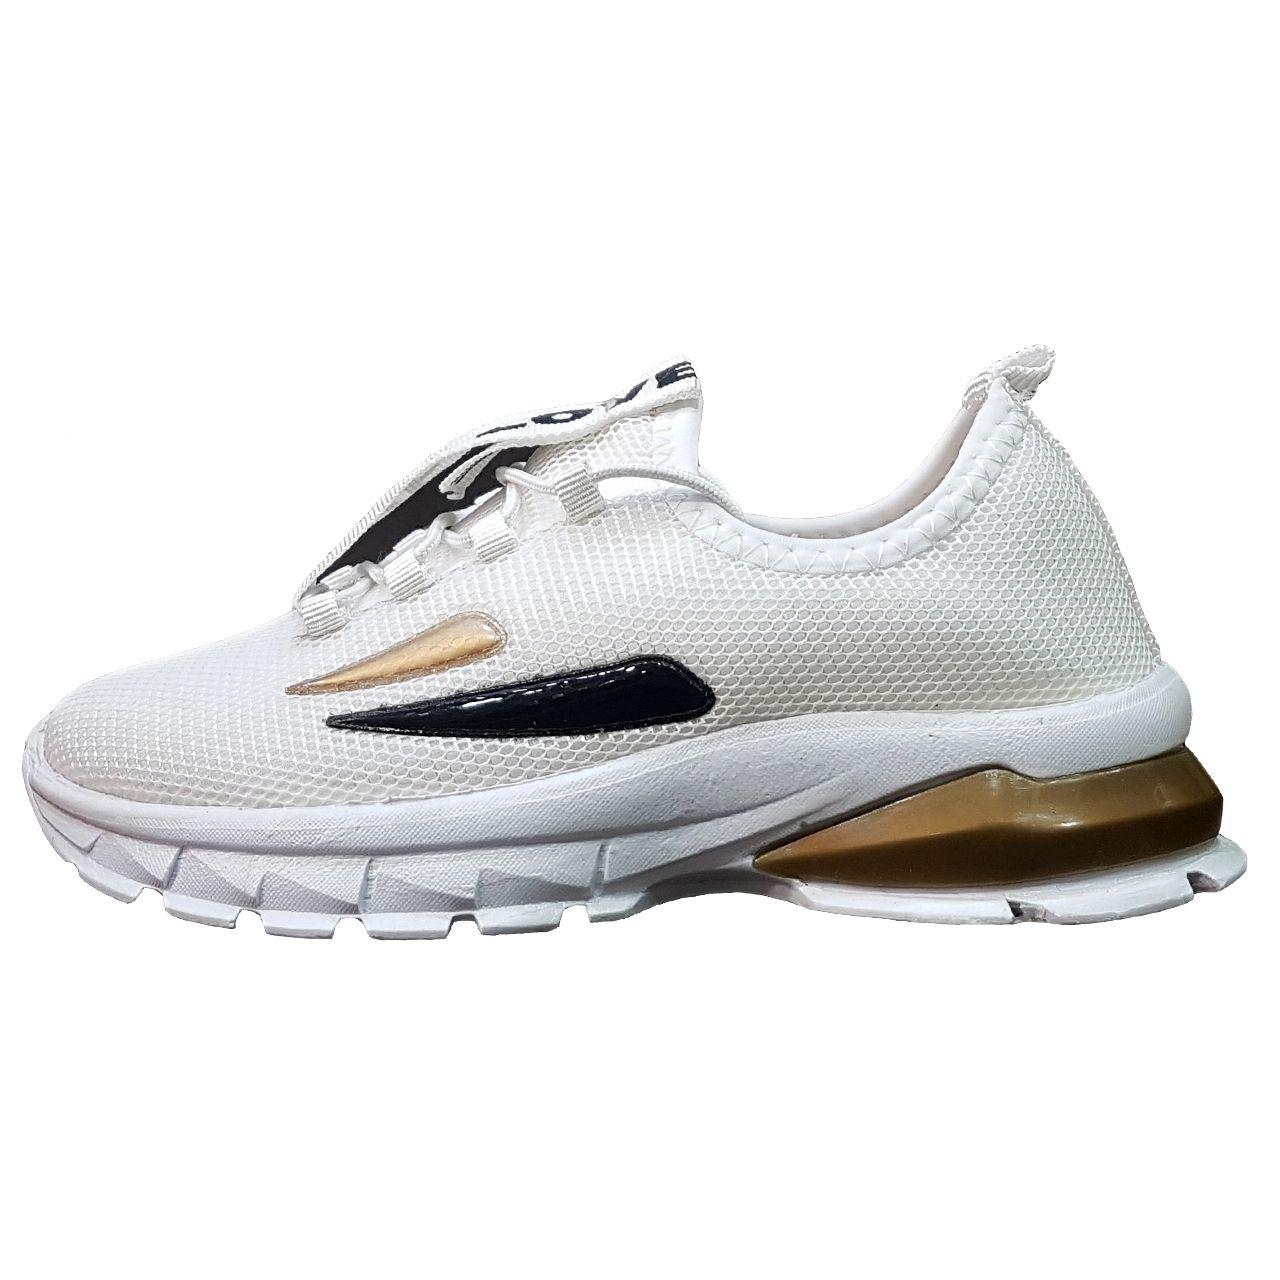 کفش پیاده روی پسرانه کد 3328090 -  - 2